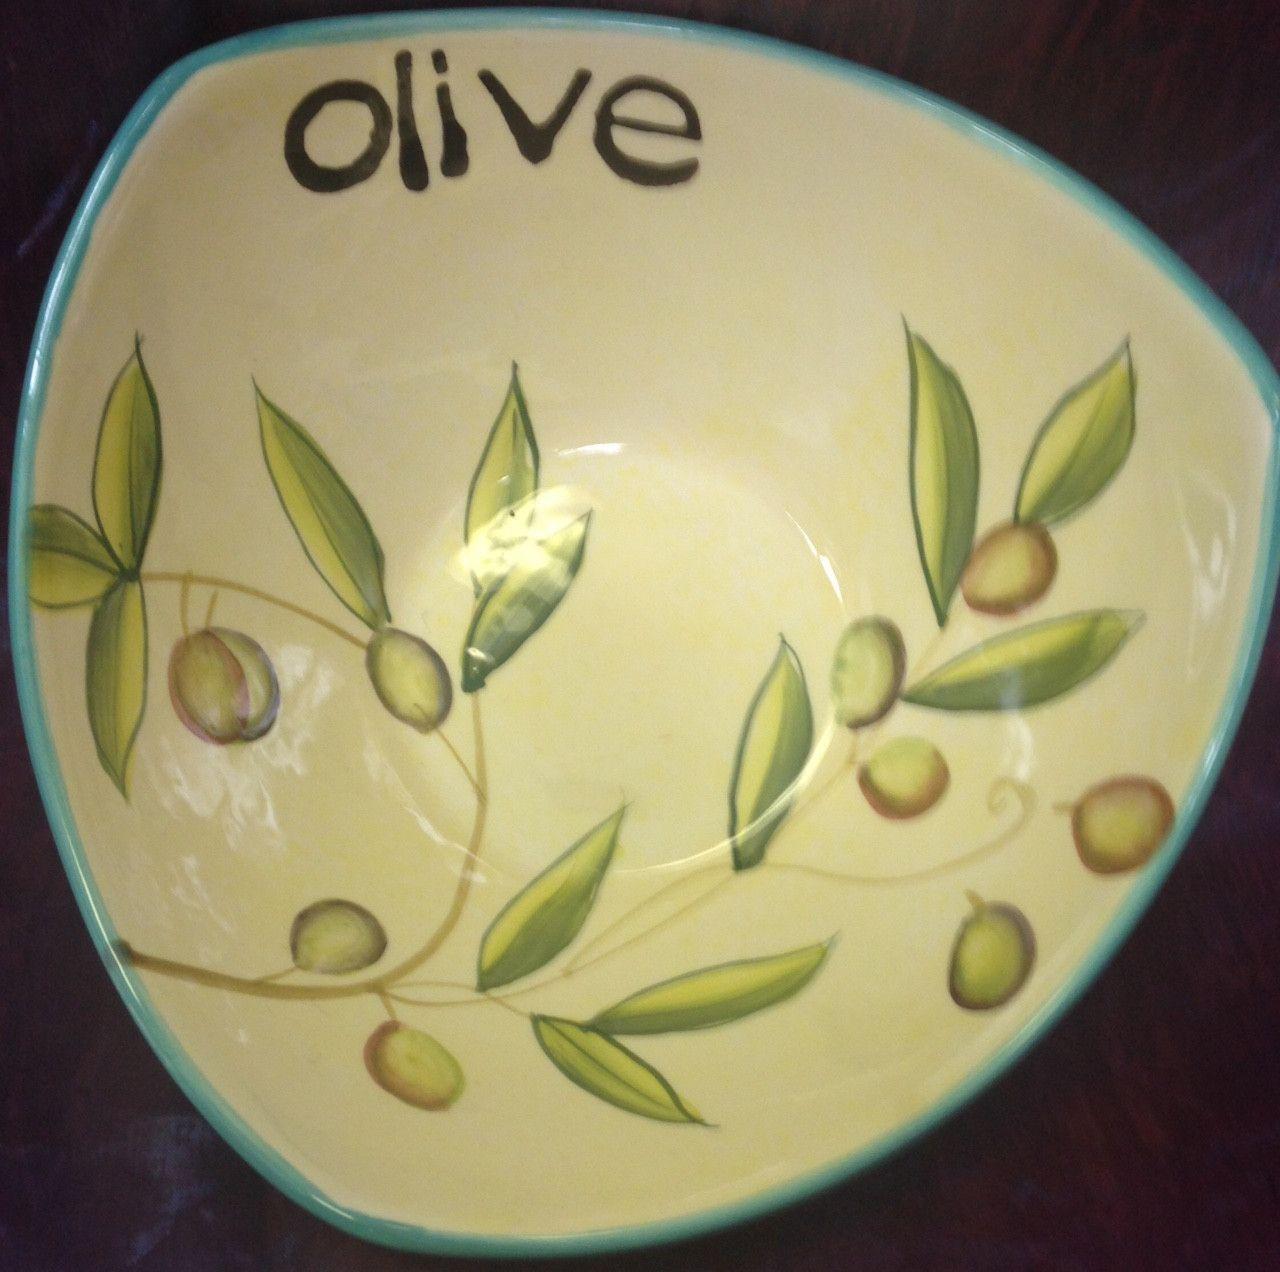 "Cypress Haindpainted Ceramic 7"" Bowl Taste Of Italy Olive"